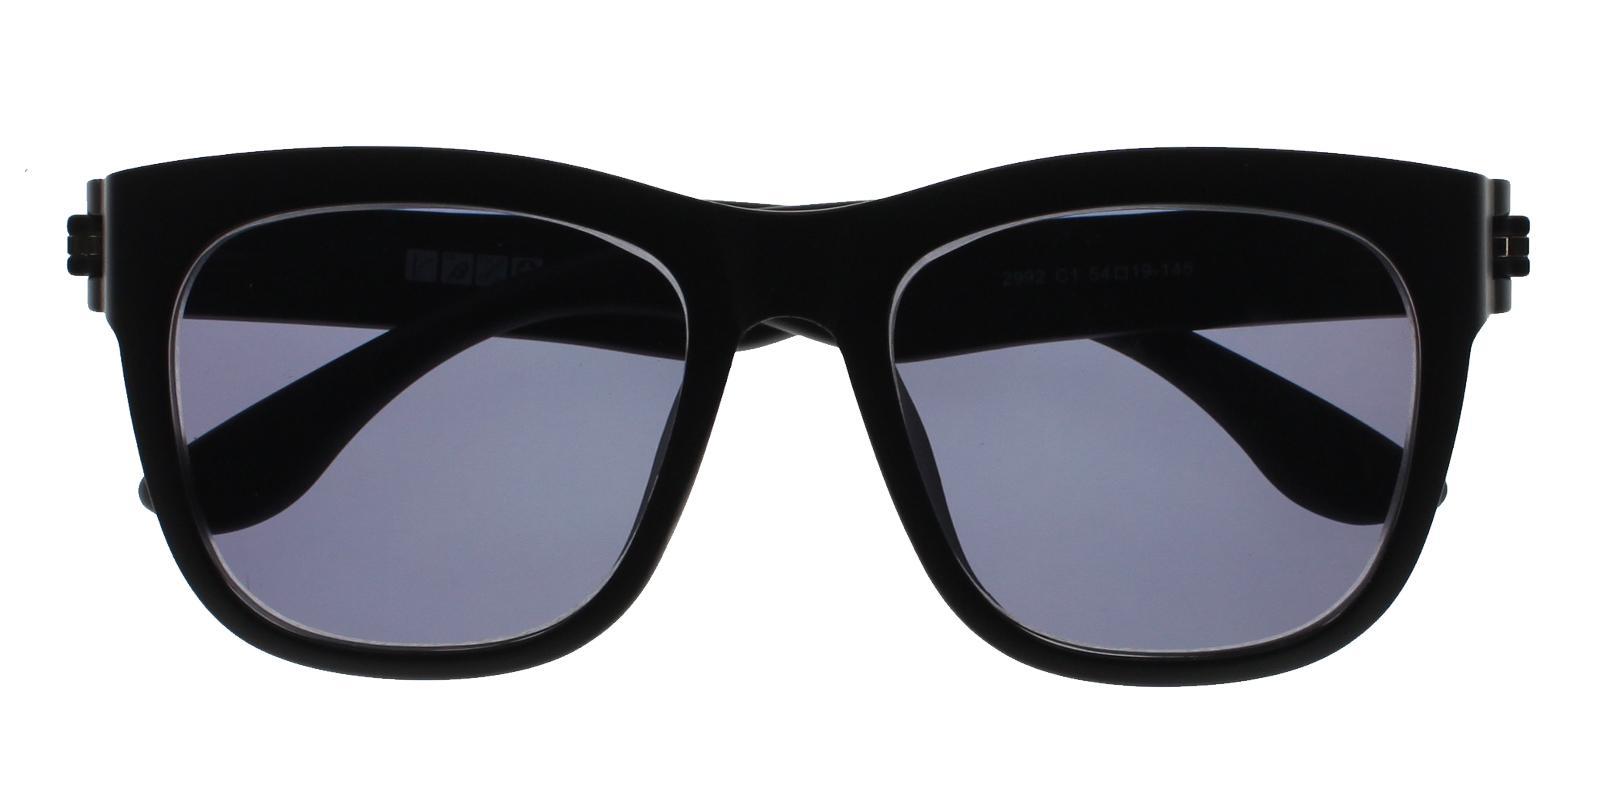 Satsuma Black TR Sunglasses , UniversalBridgeFit Frames from ABBE Glasses